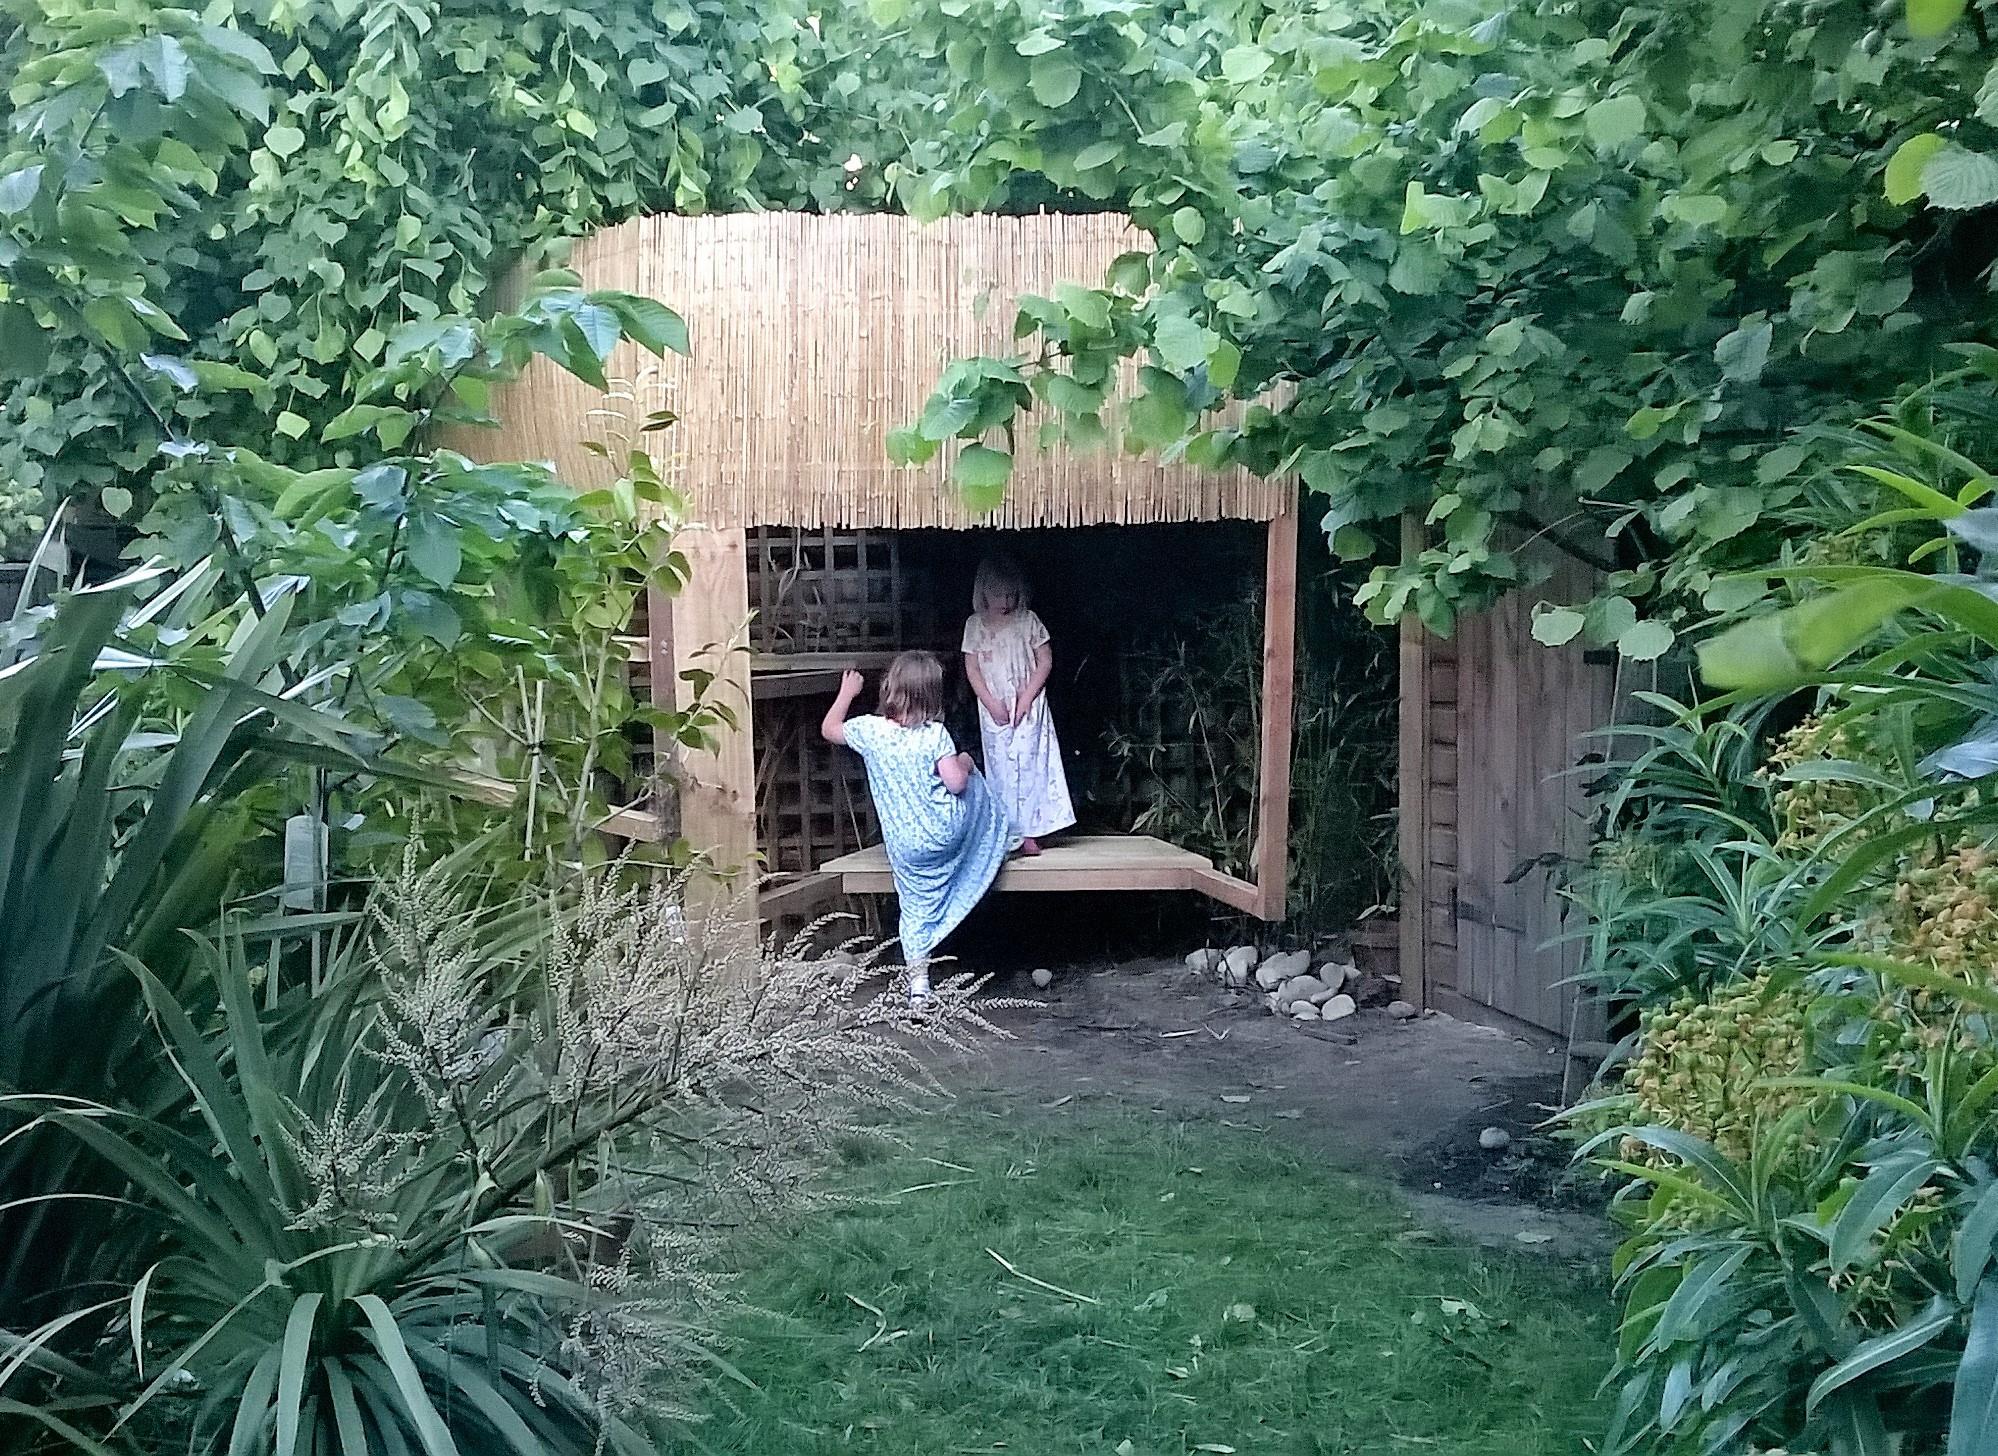 Treehouse garden design